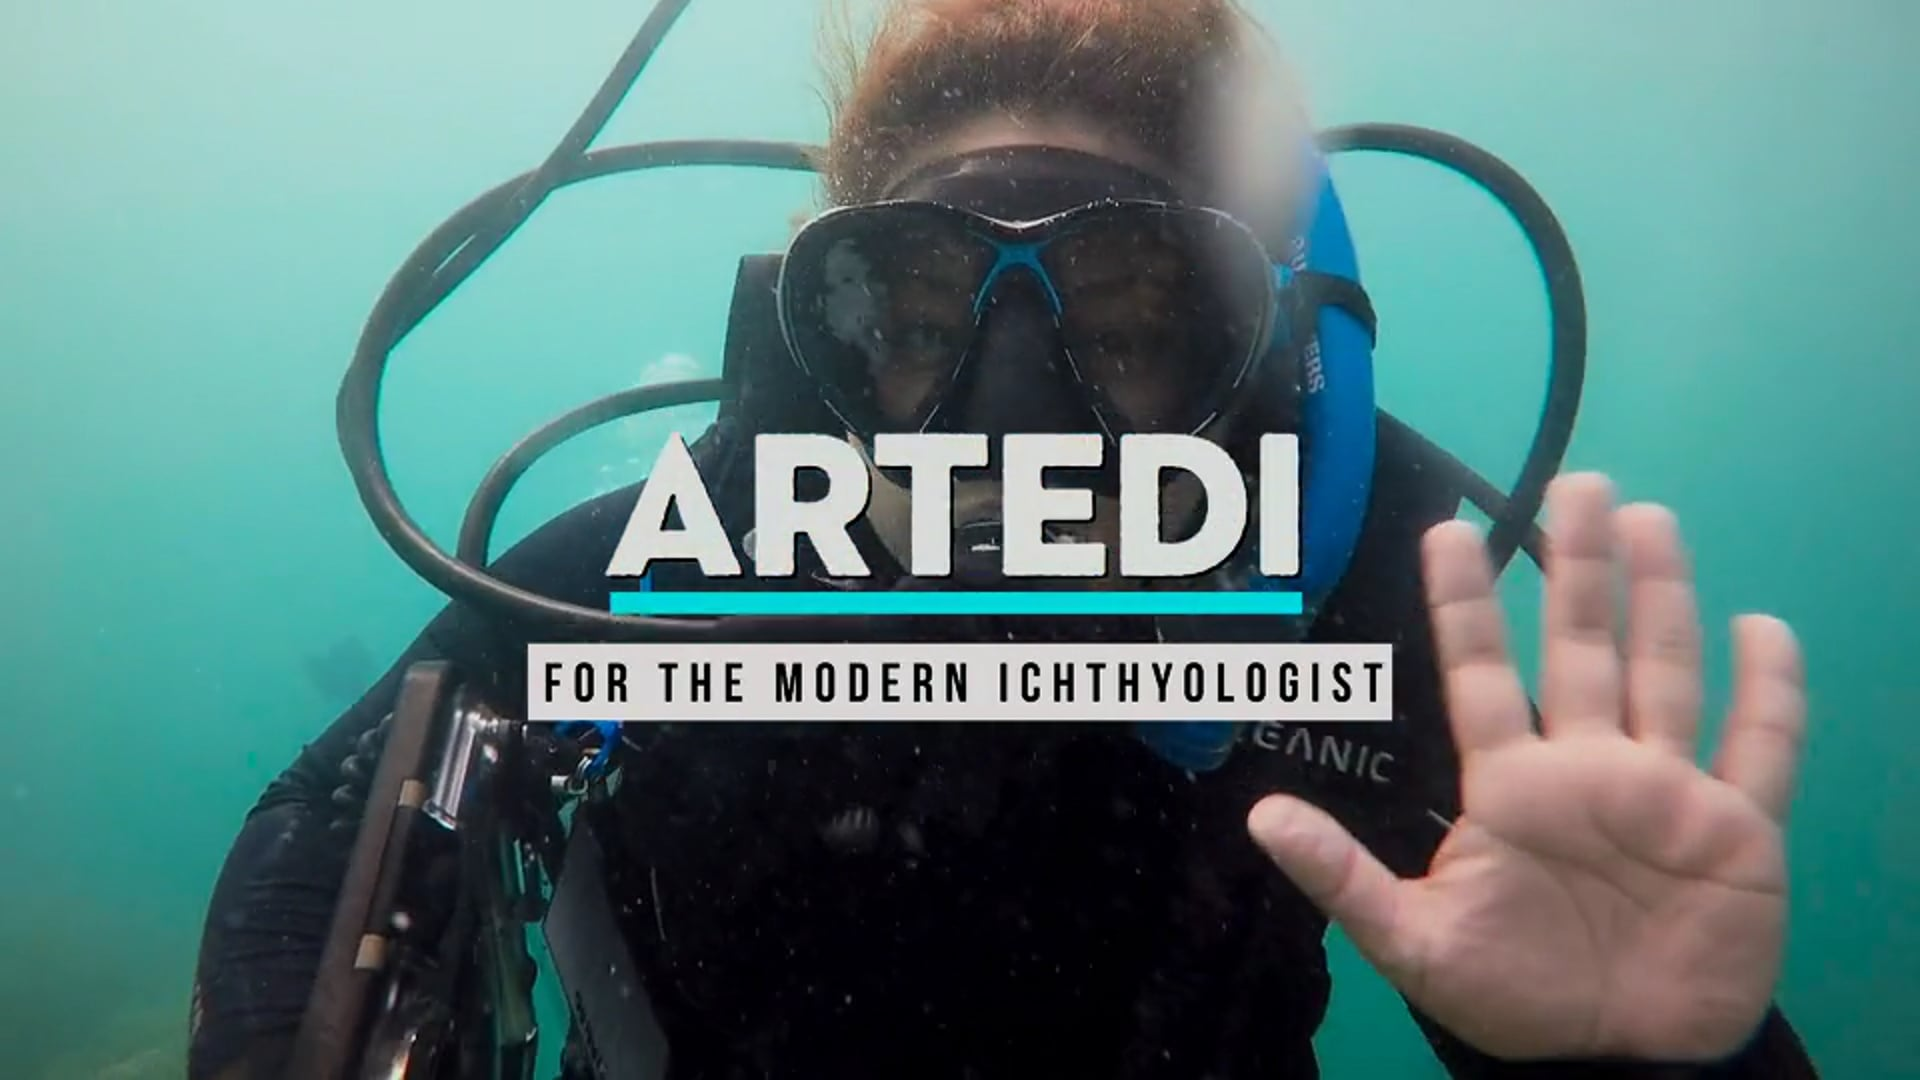 Artedi: An Experiment in Efficacy